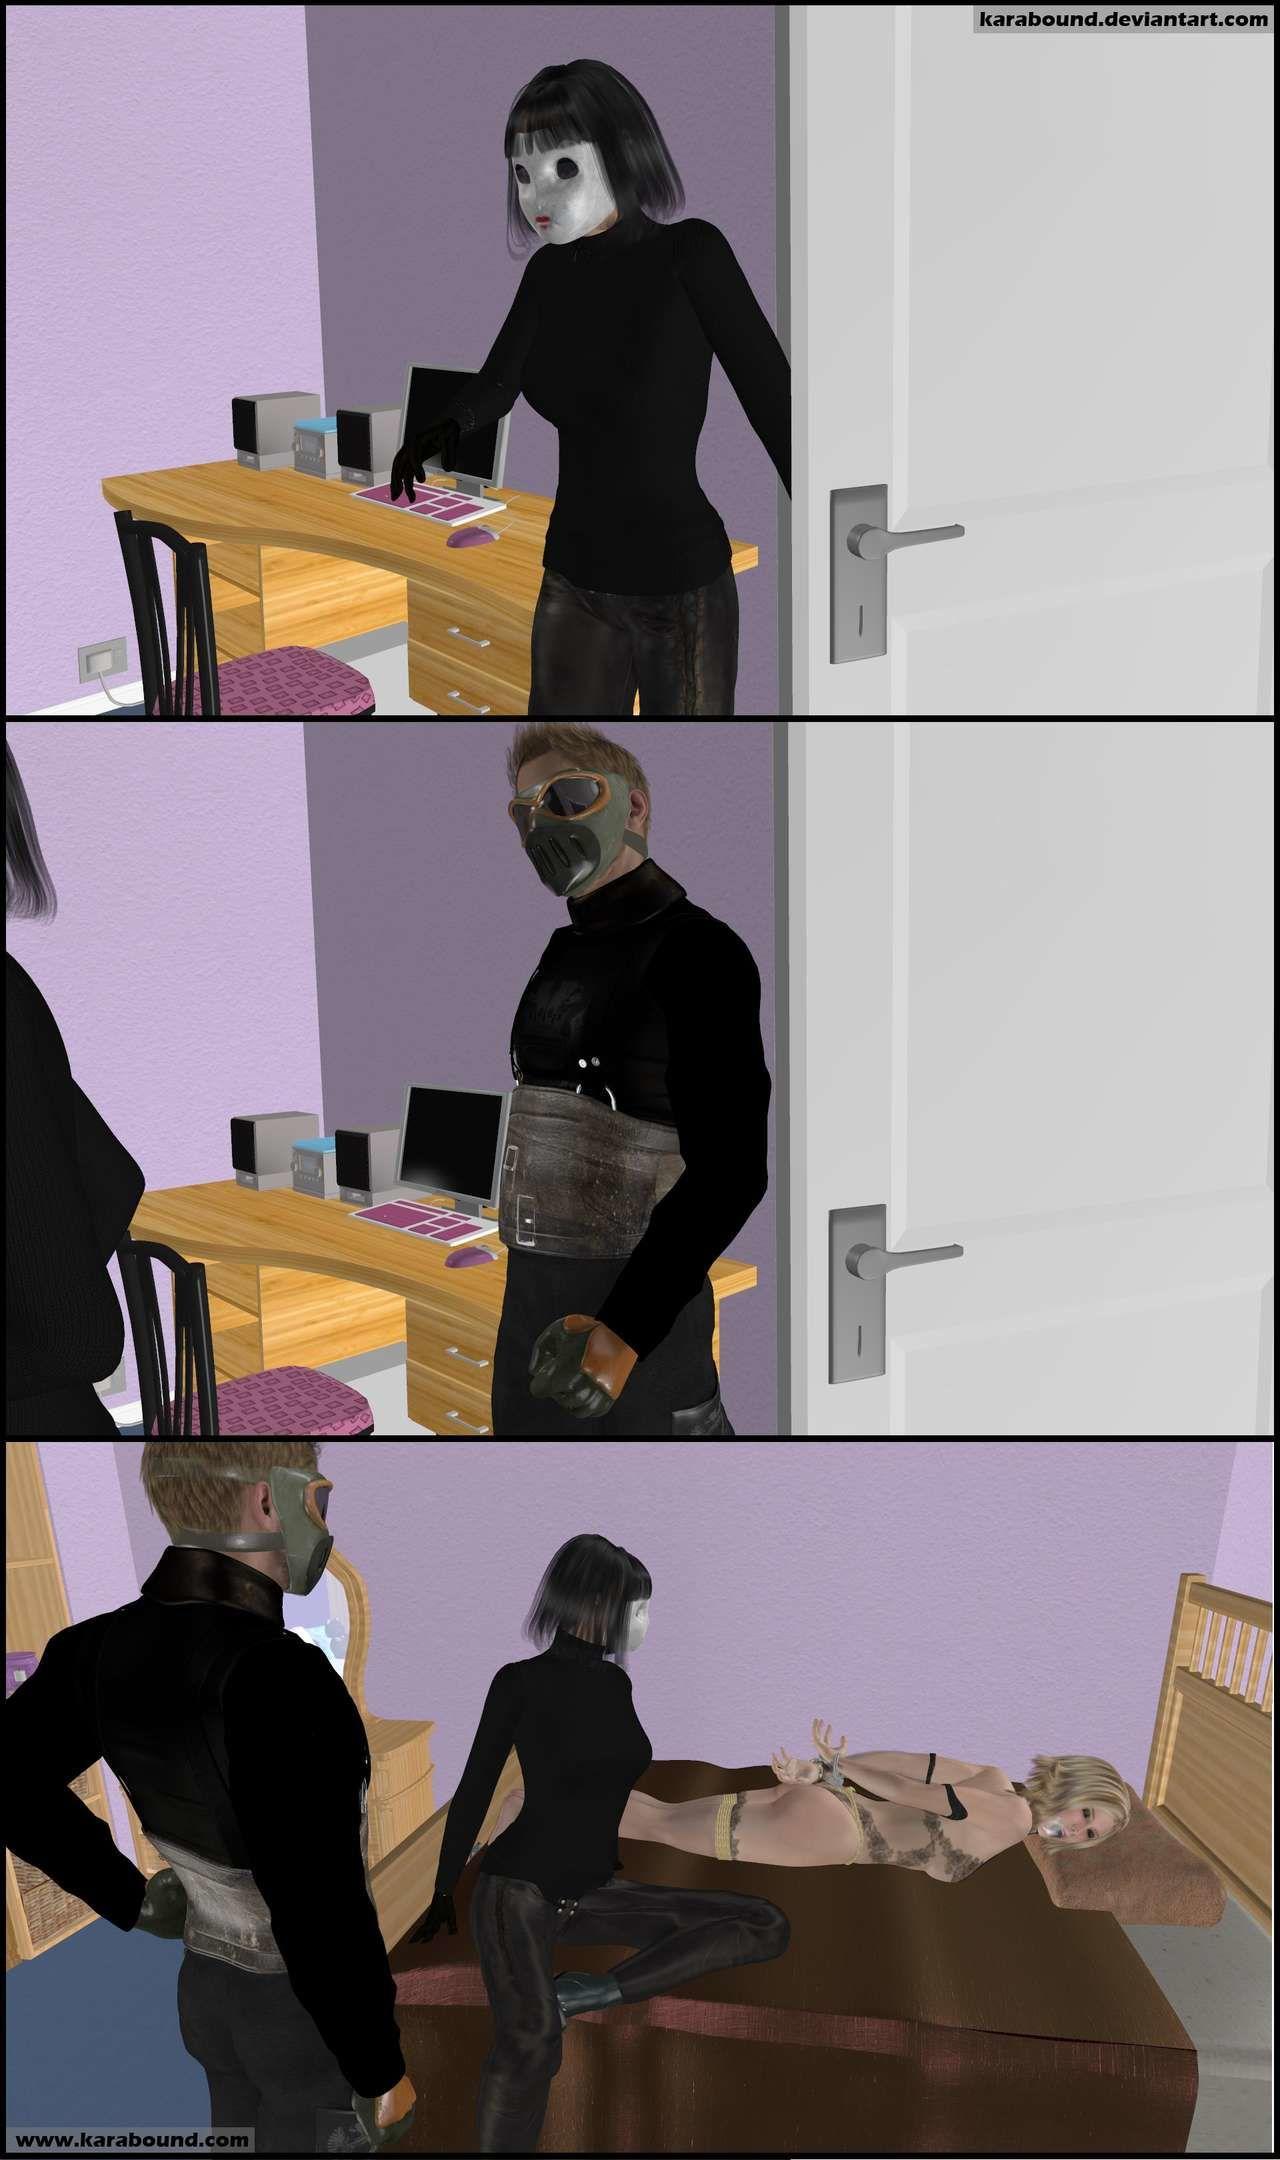 Artist3d Karabound Chapter 5 complete - part 5